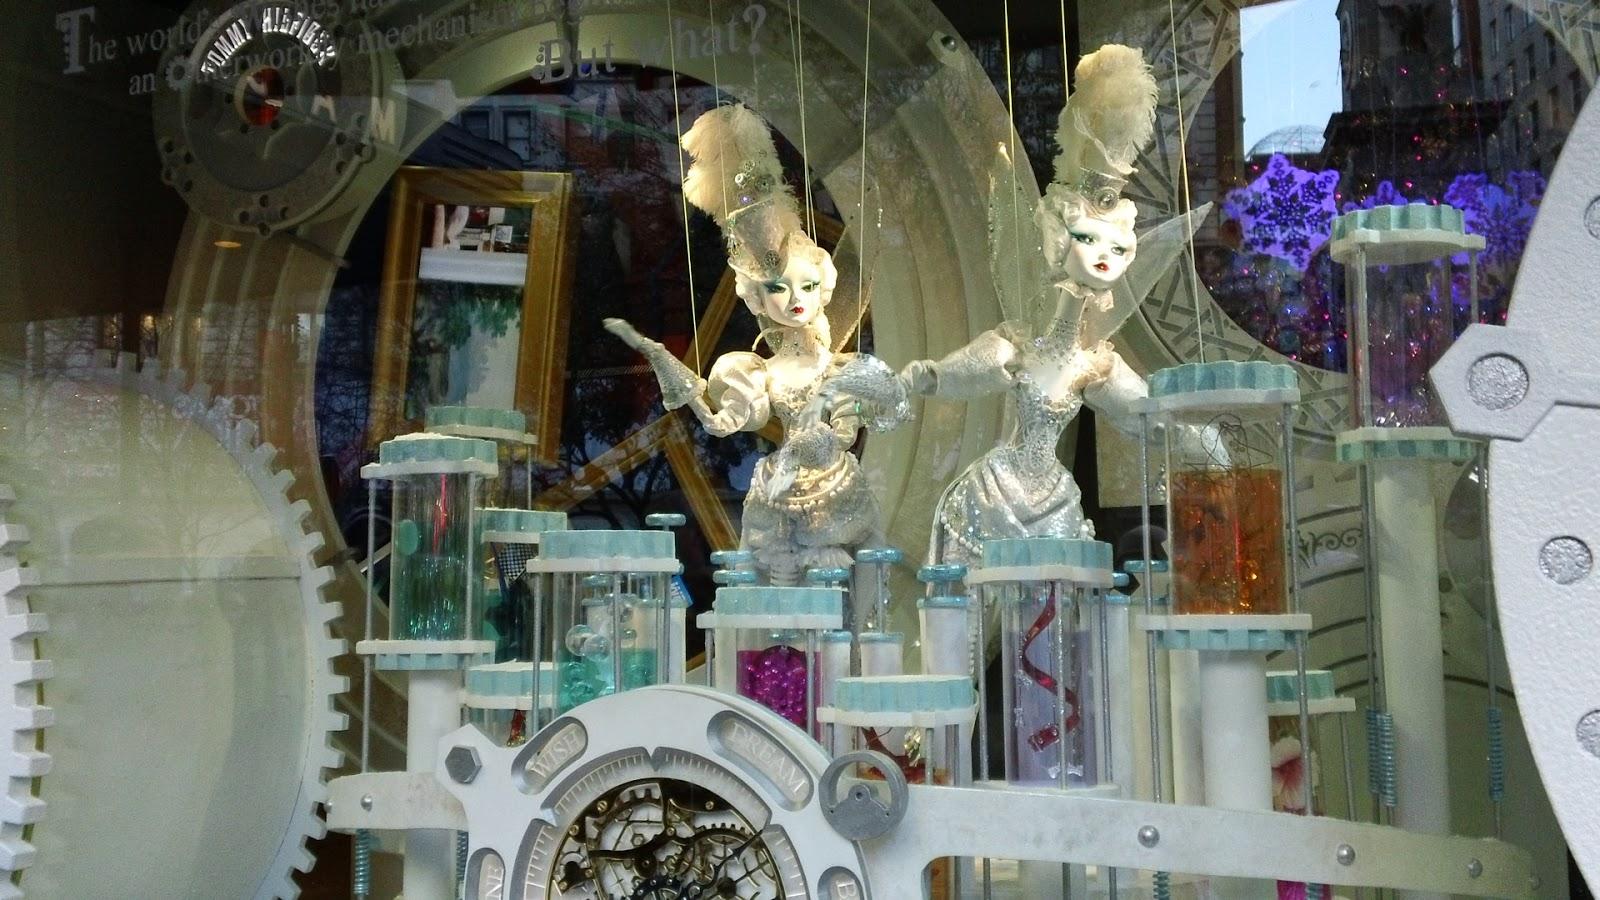 Medibeads decoracion de vitrinas en macys new york for Decoracion para vitrinas